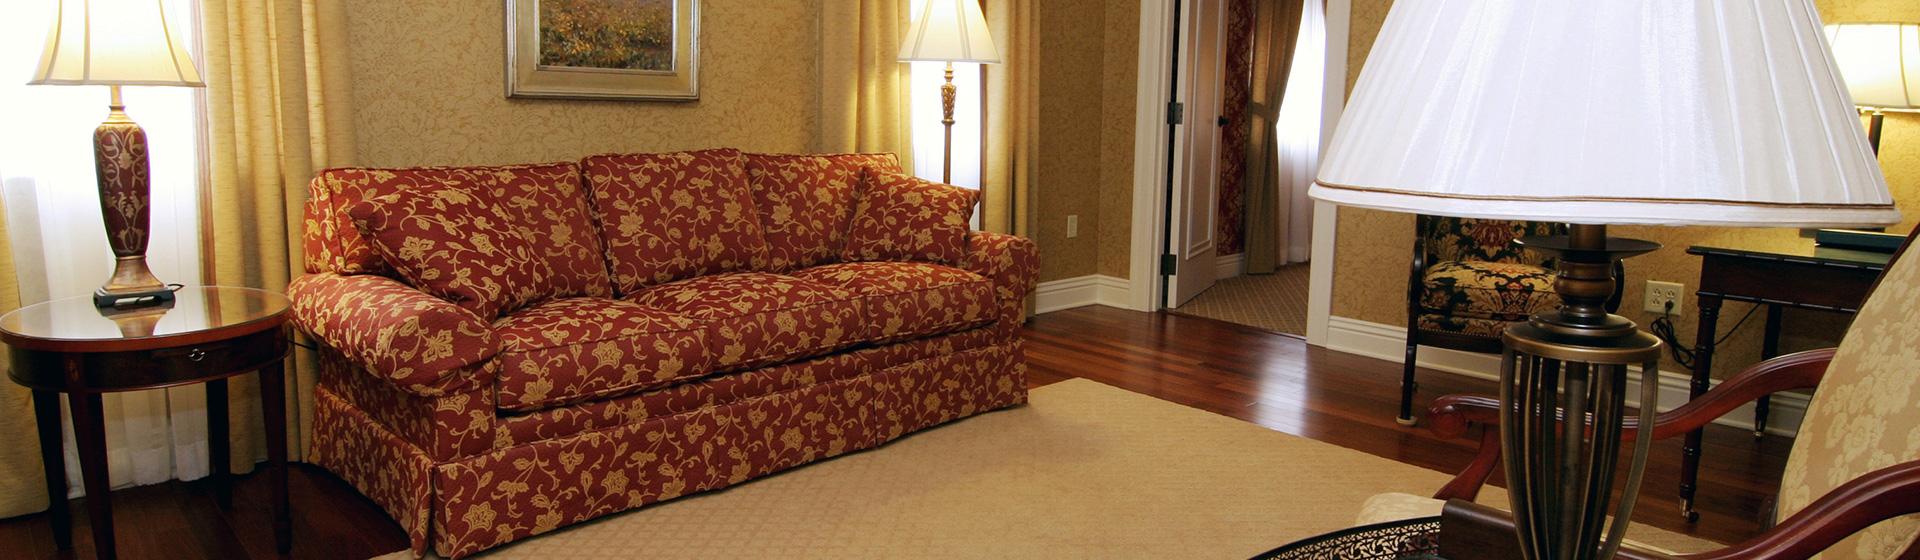 Full Suite of Charley Creek Inn - Wabash, Indiana